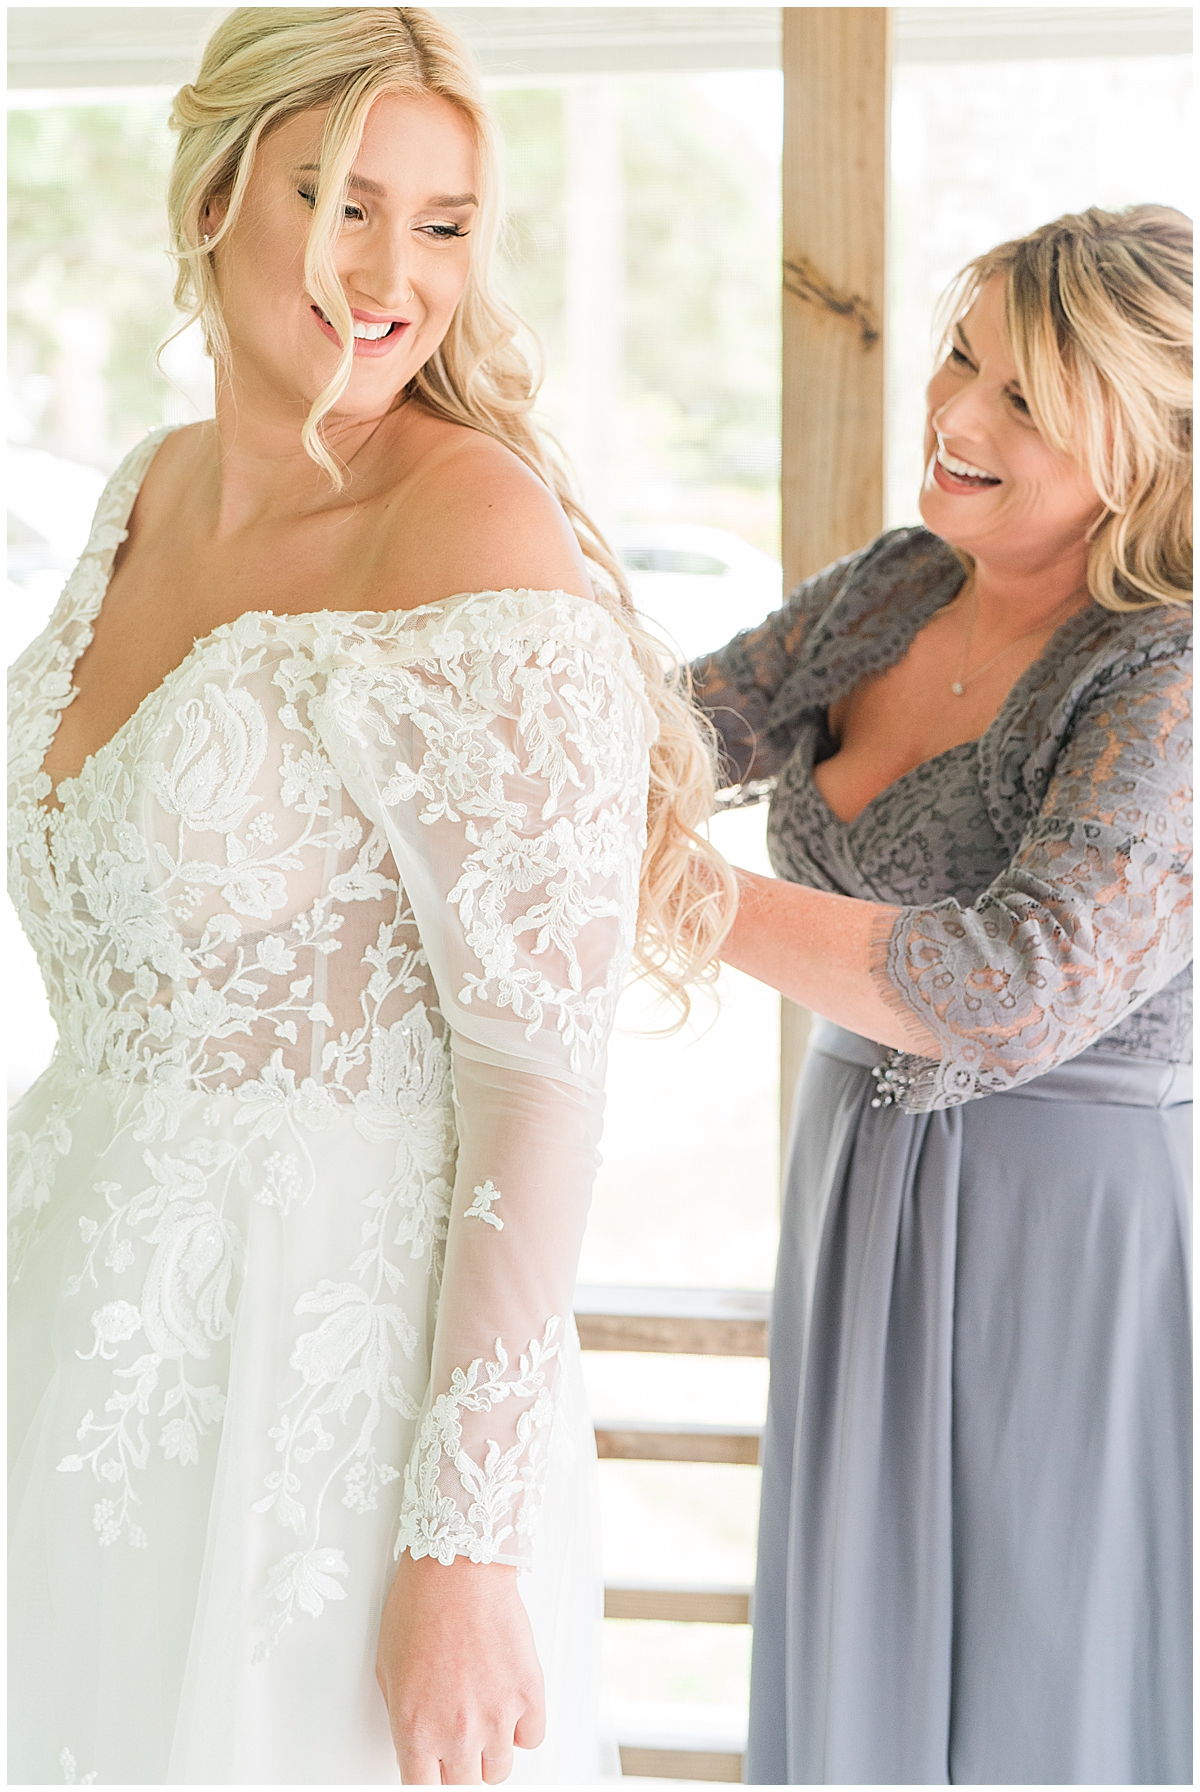 mother helps bride with wedding dress before Charleston wedding